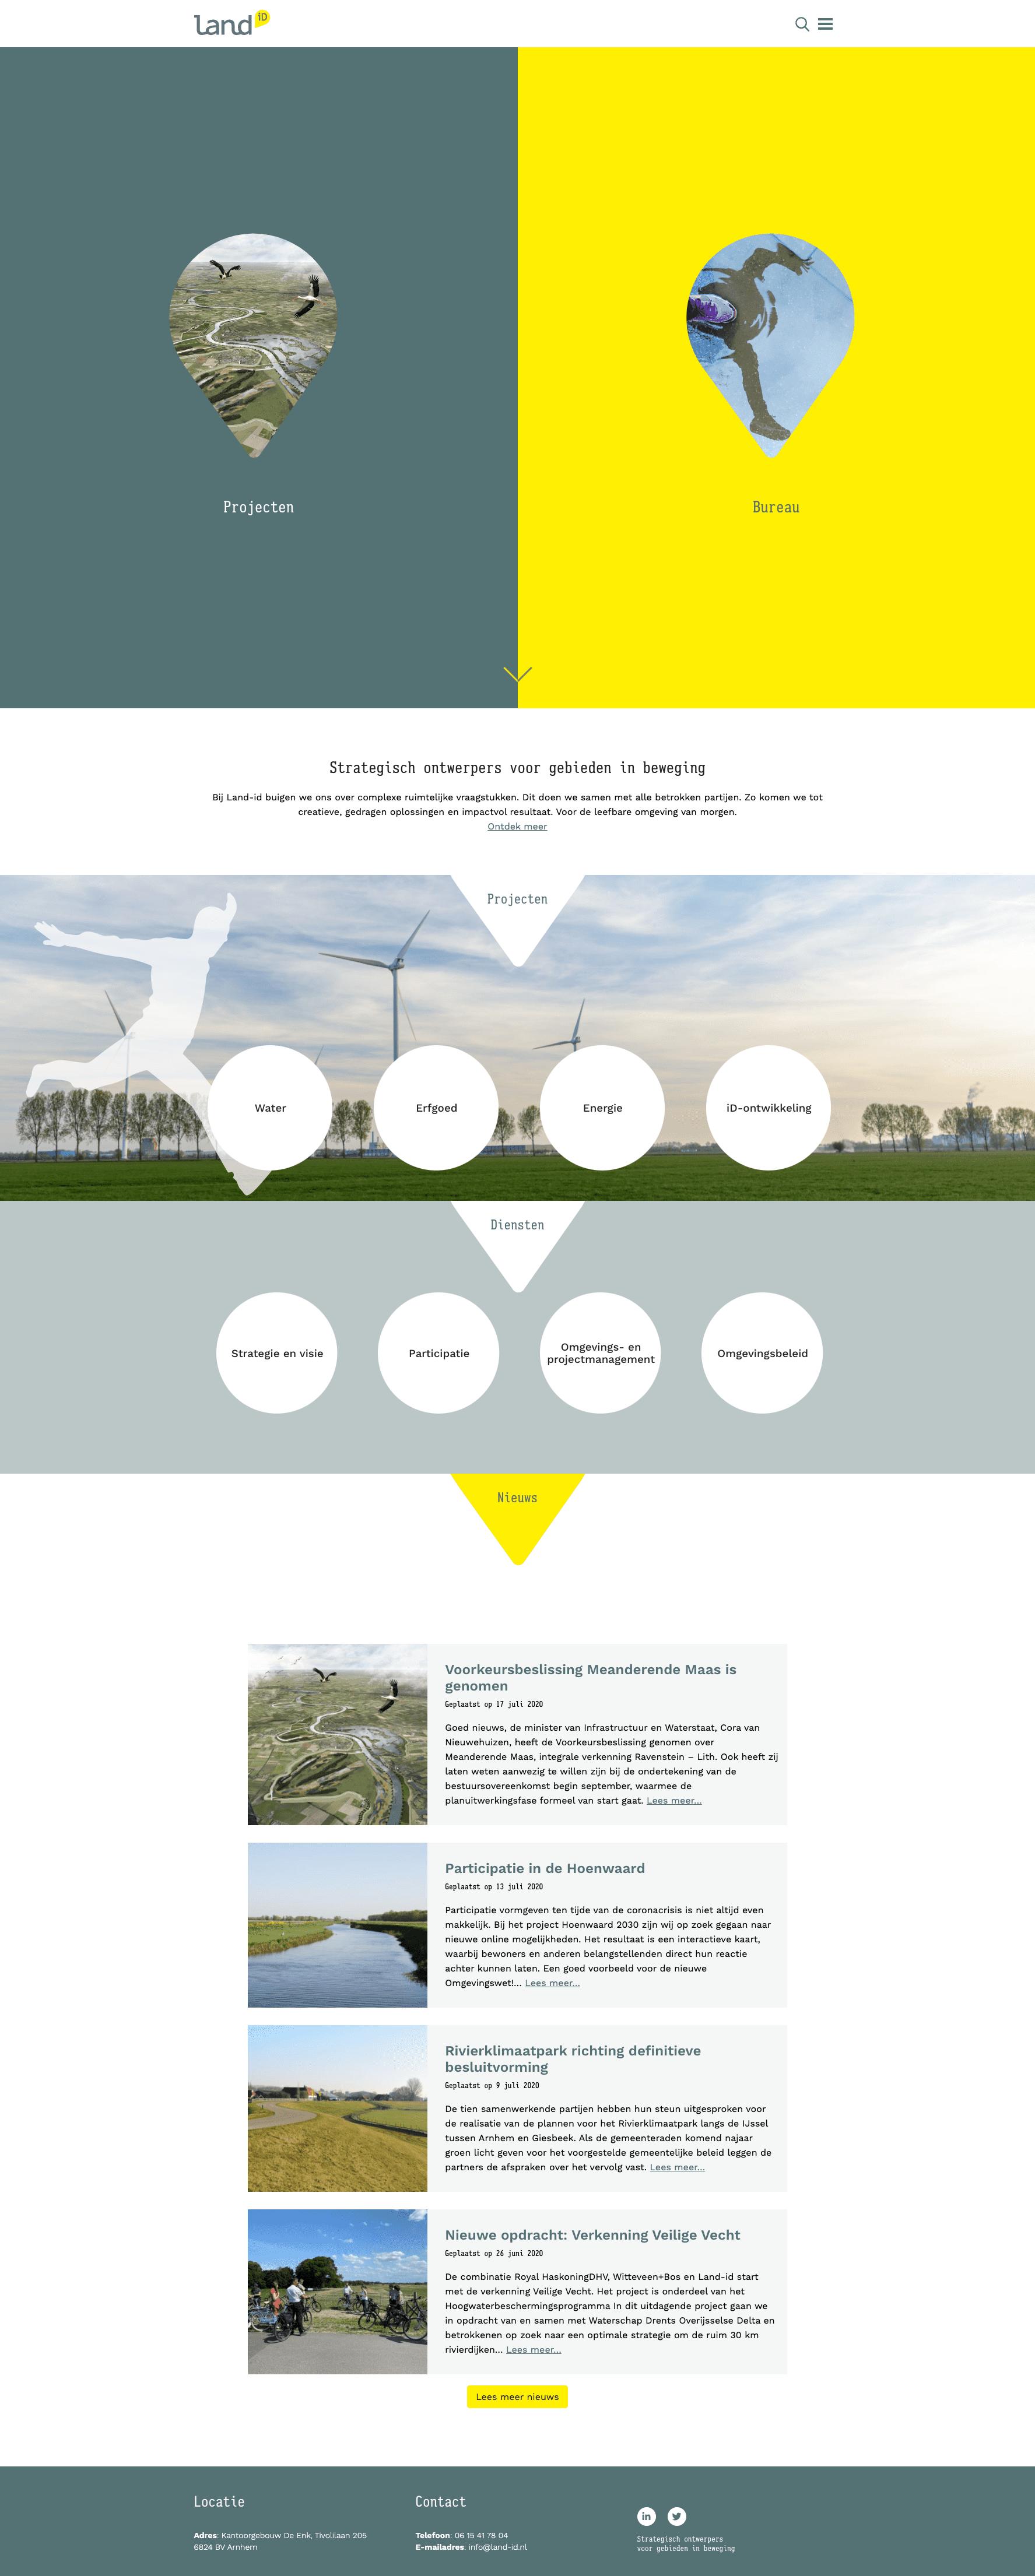 Website landid.nl